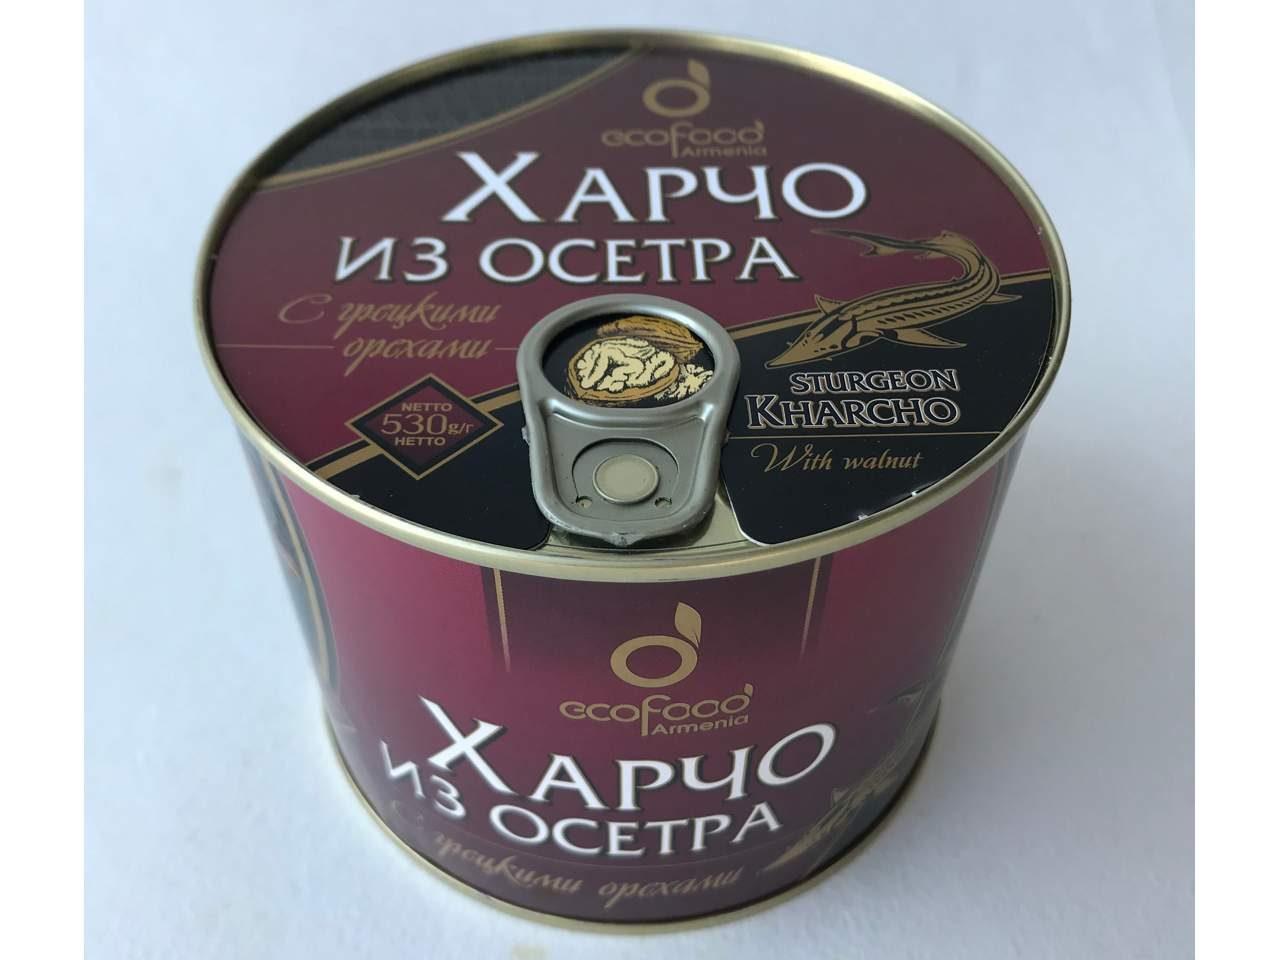 harcho_osetra